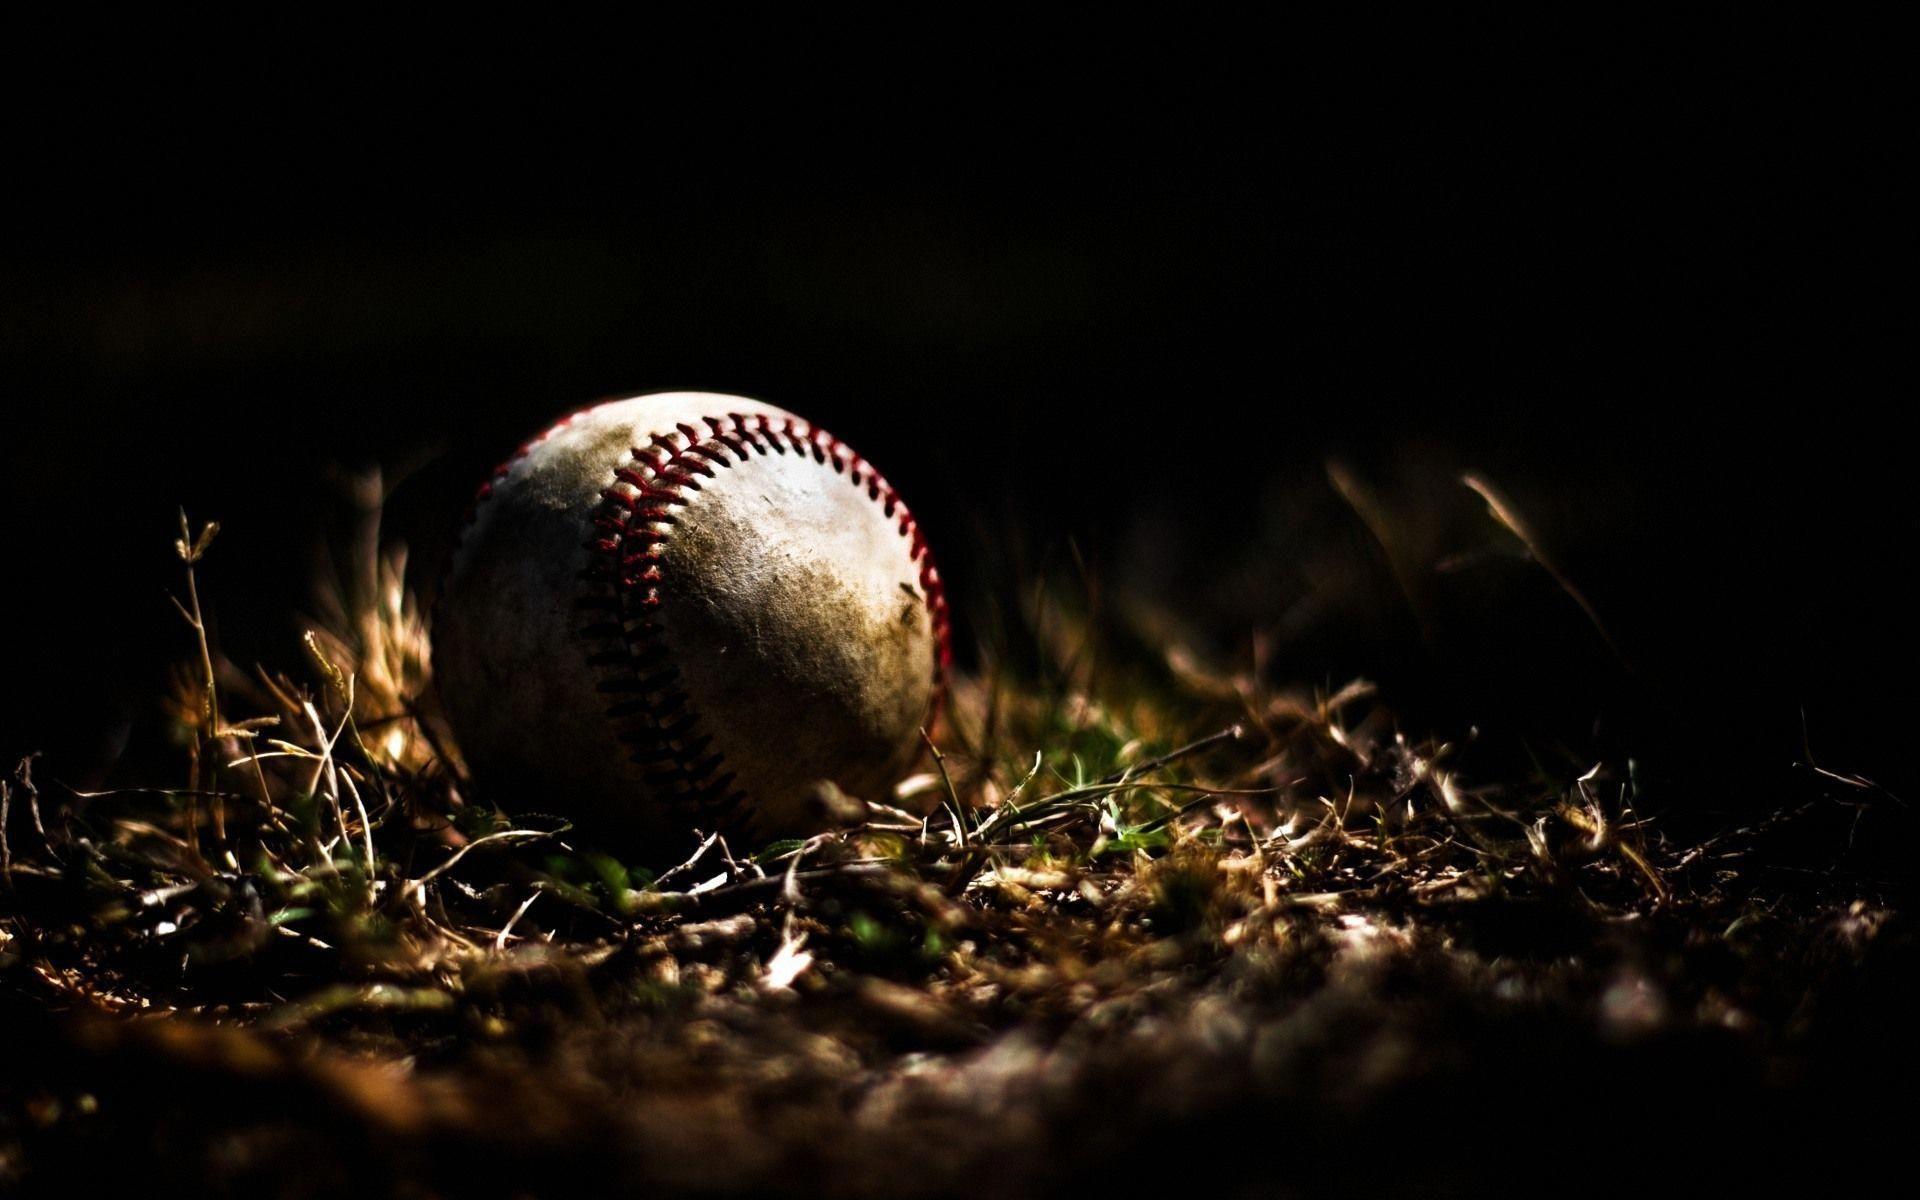 Softball Images Baseball wallpaper, Baseball, Baseball